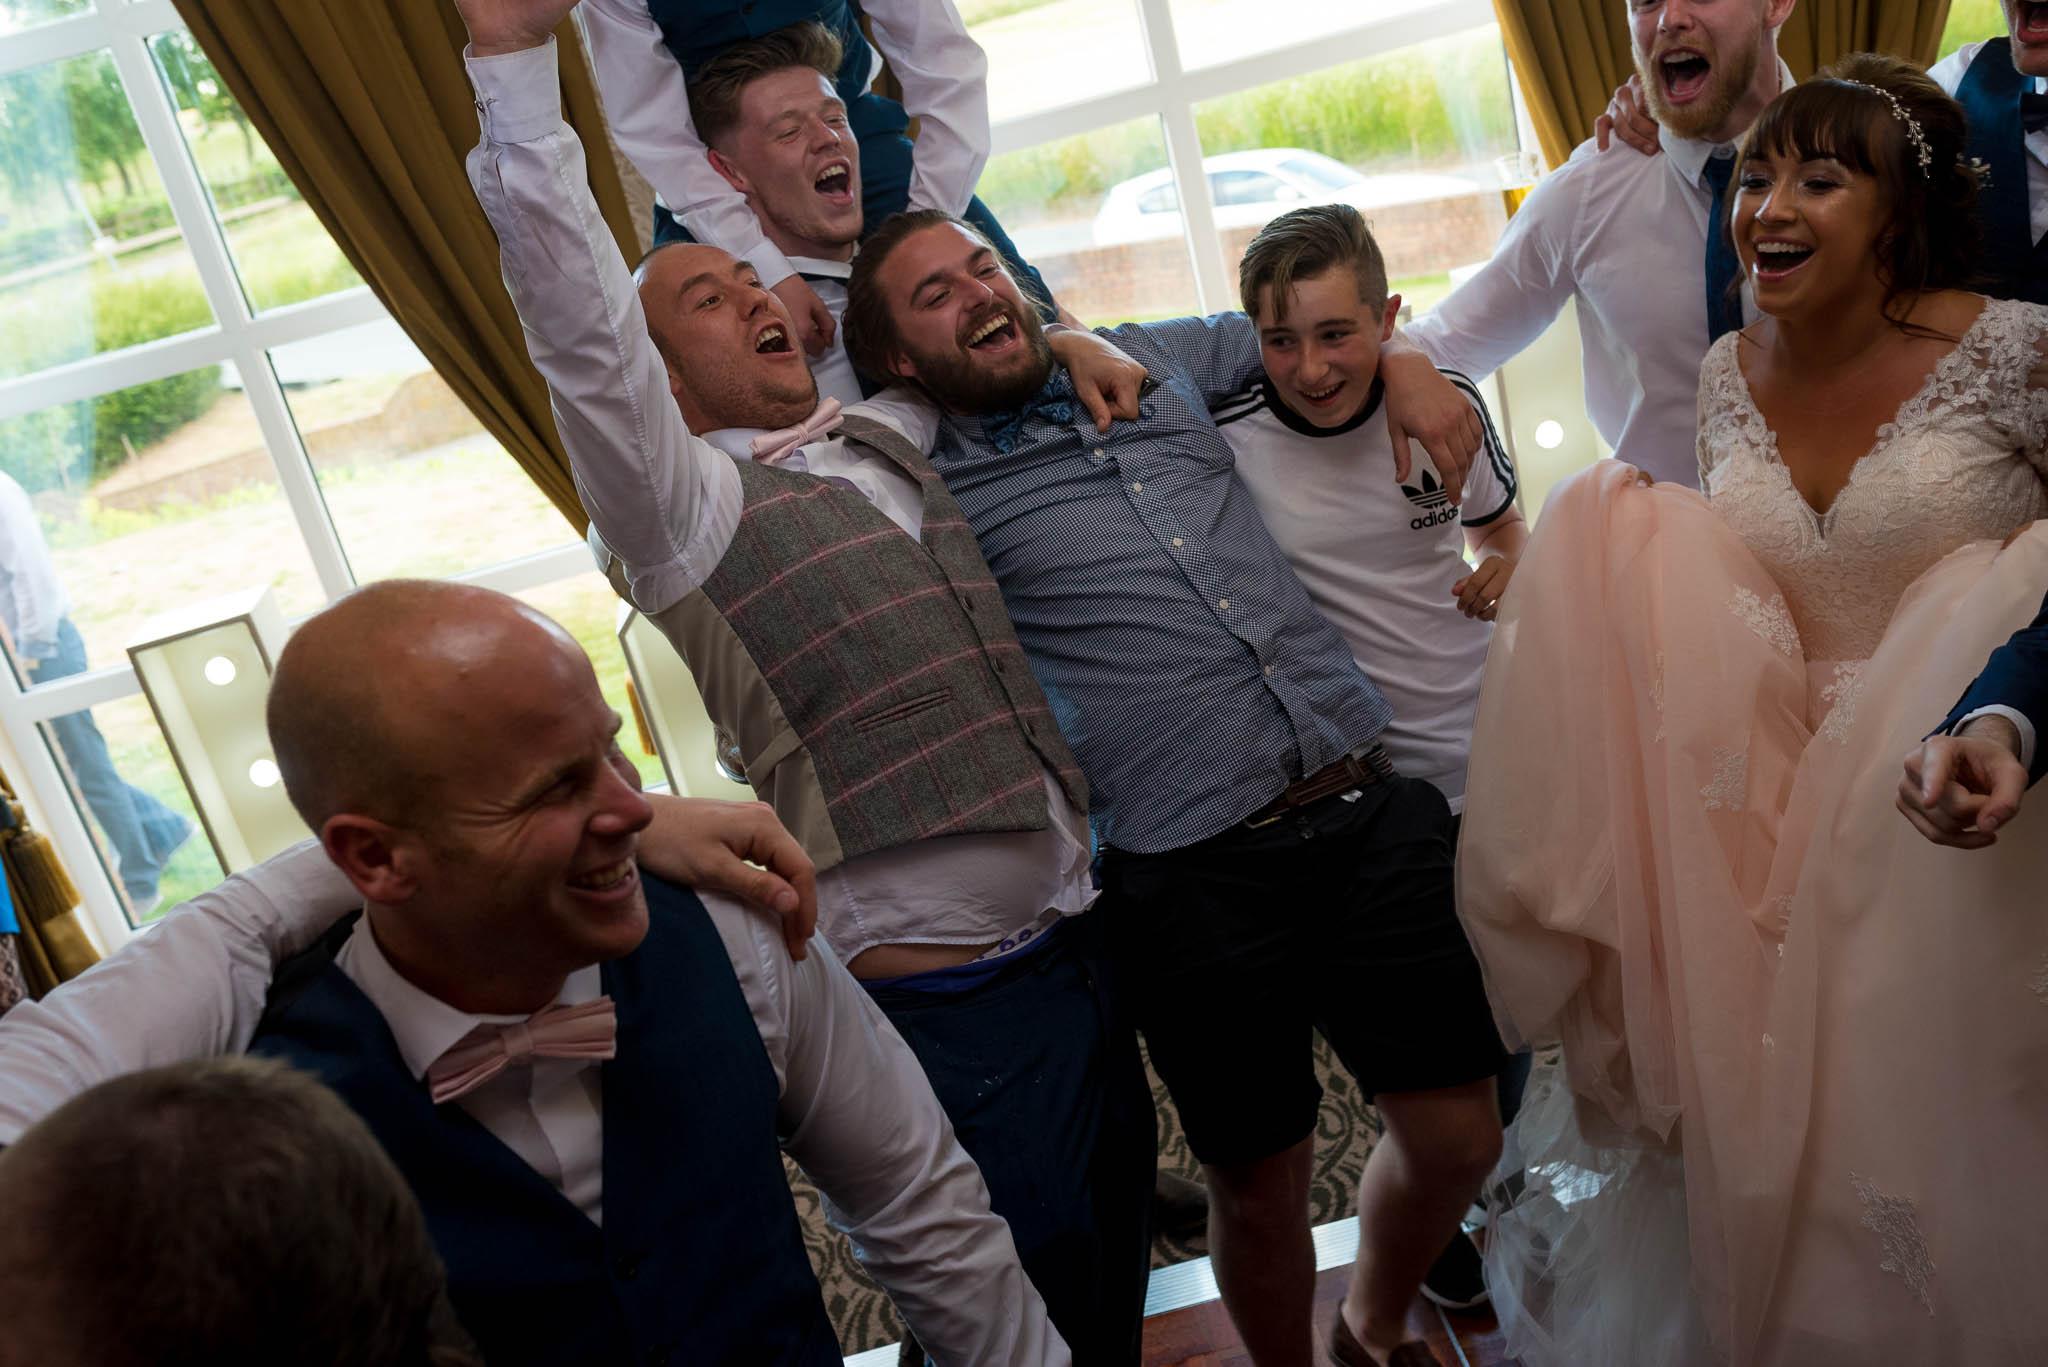 Darrington Golf Club Wedding Photographer164.jpg